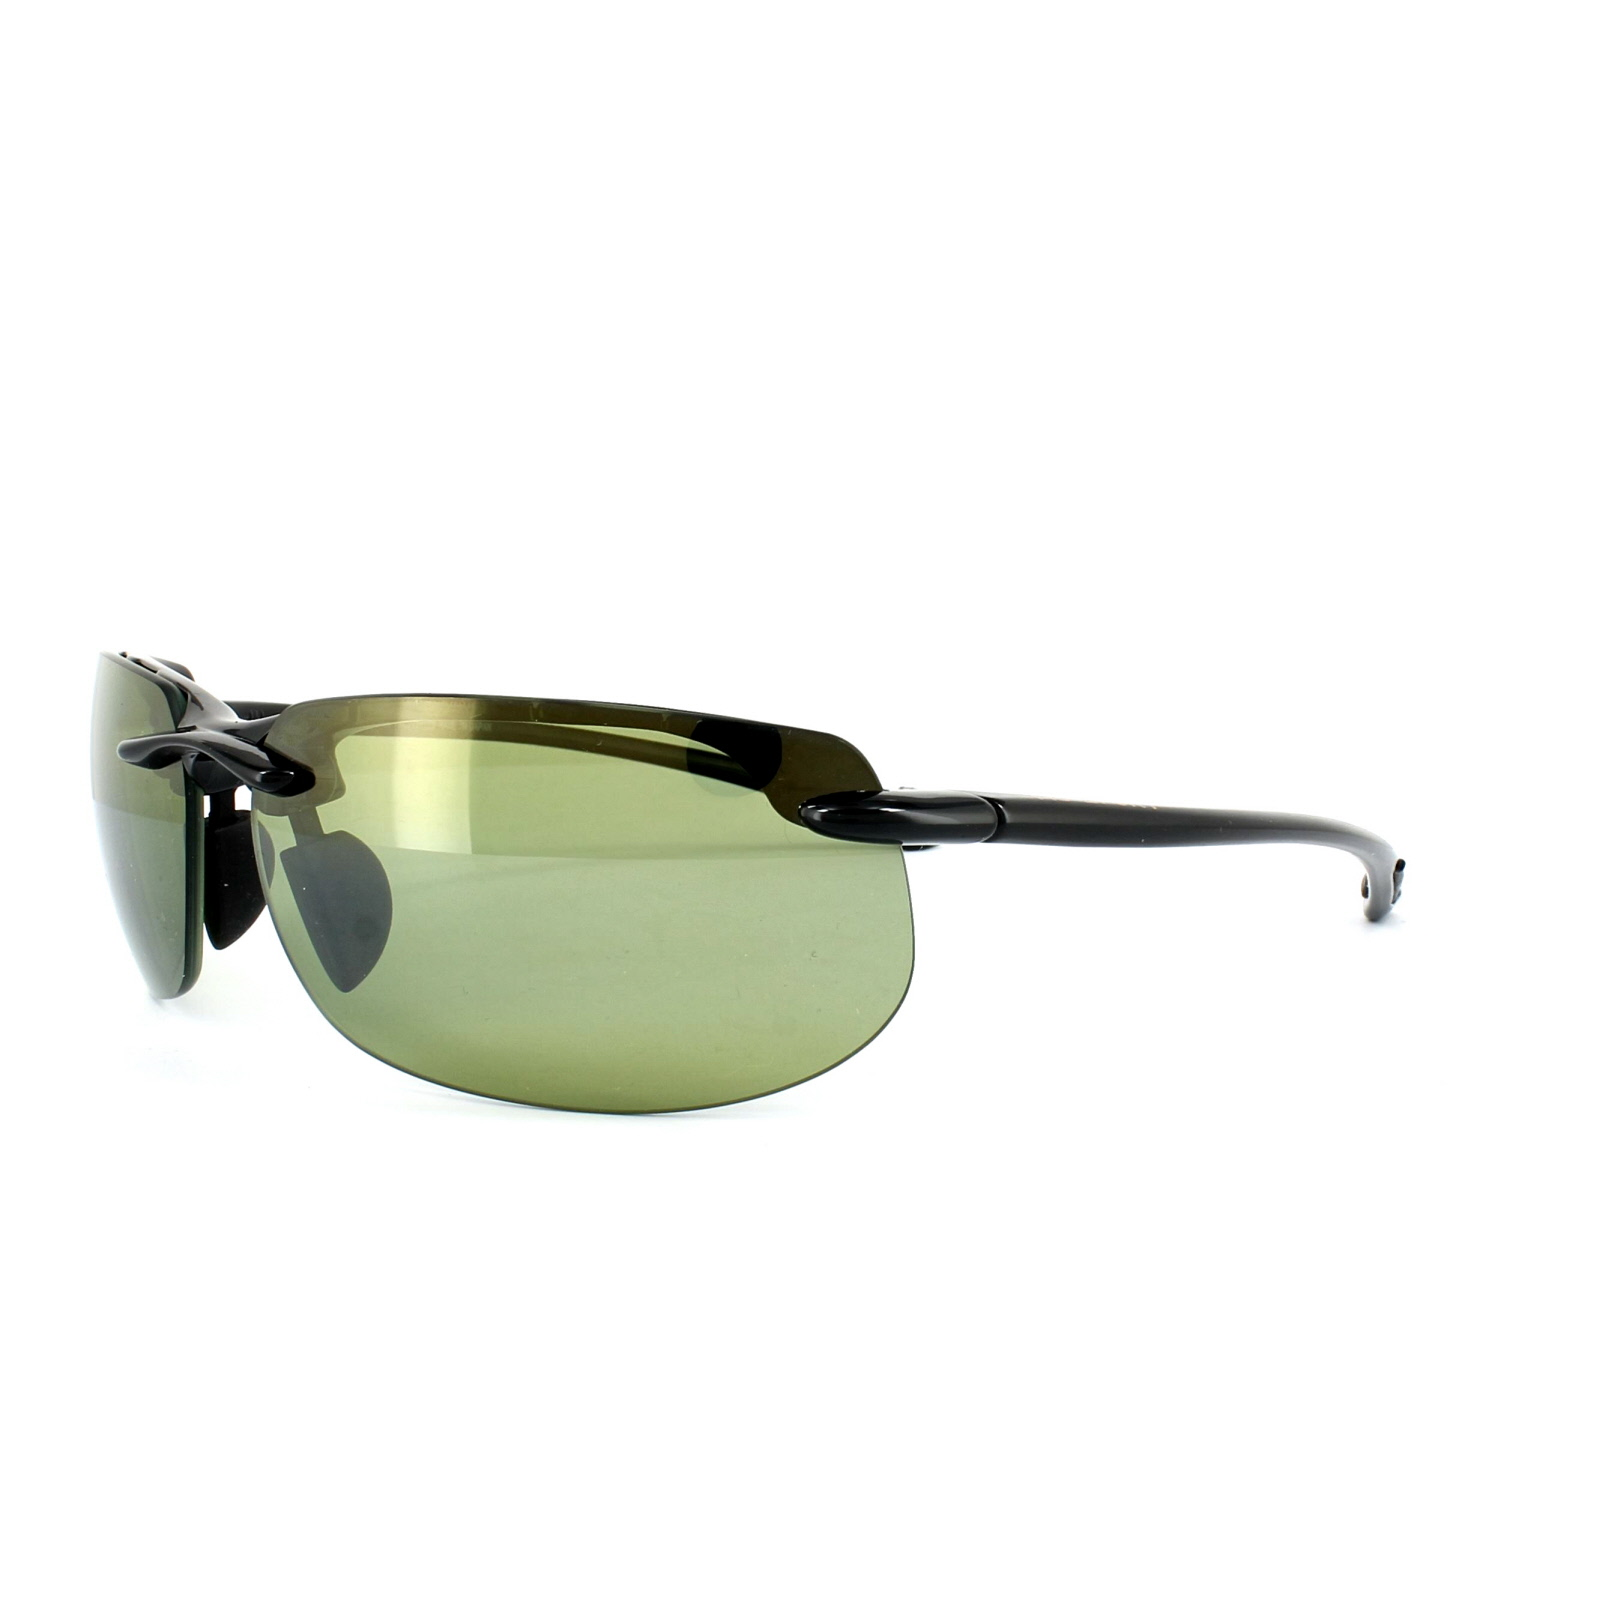 5396c1239b9c Details about Maui Jim Sunglasses Banyans HT412-02 Gloss Black Maui HT  Green Polarized